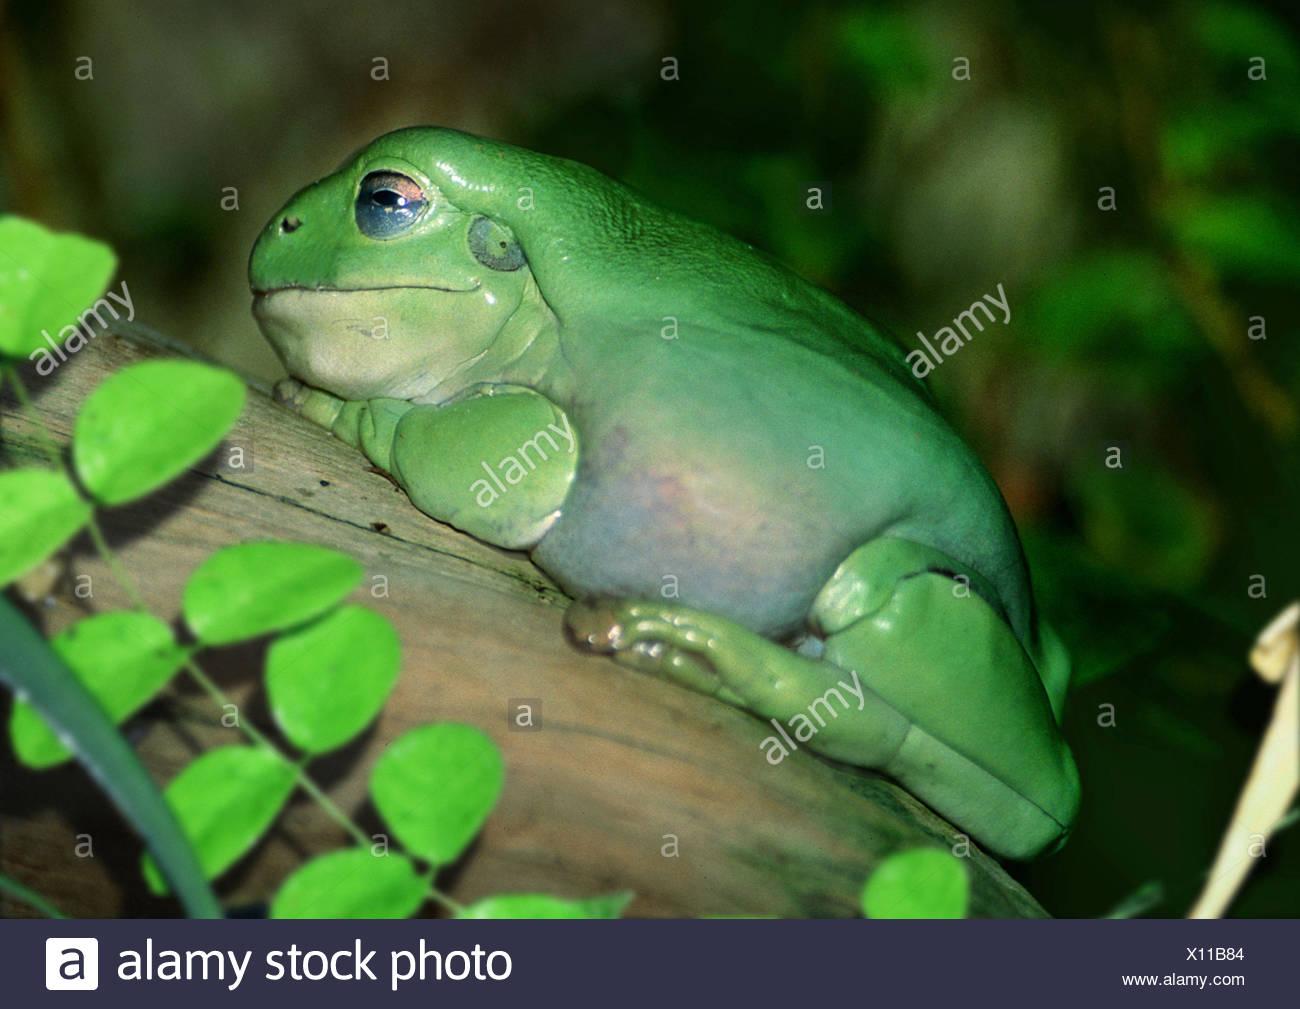 Green Tree Frog White's Treefrog (Litoria caerulea, Hyla caerulea, Pelodryas caerulea), on a branch, Australia - Stock Image